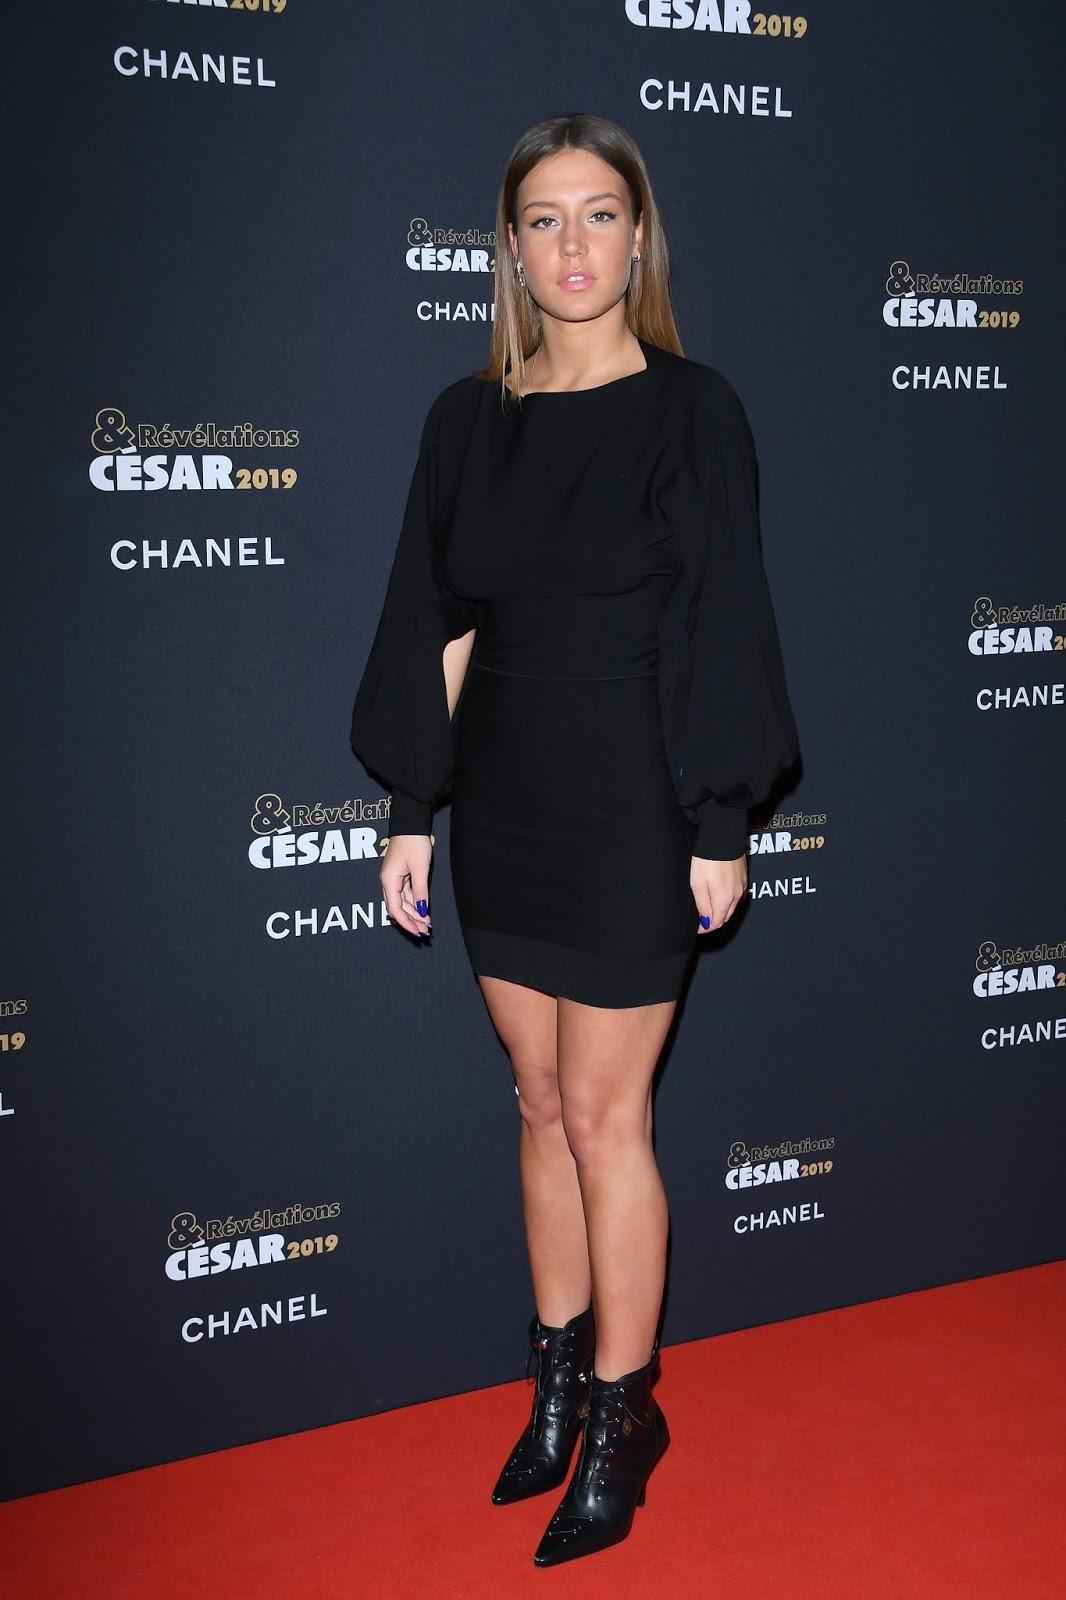 Adele Exarchopoulos - 'Cesar - Revelations 2019' in Paris 01/14/19